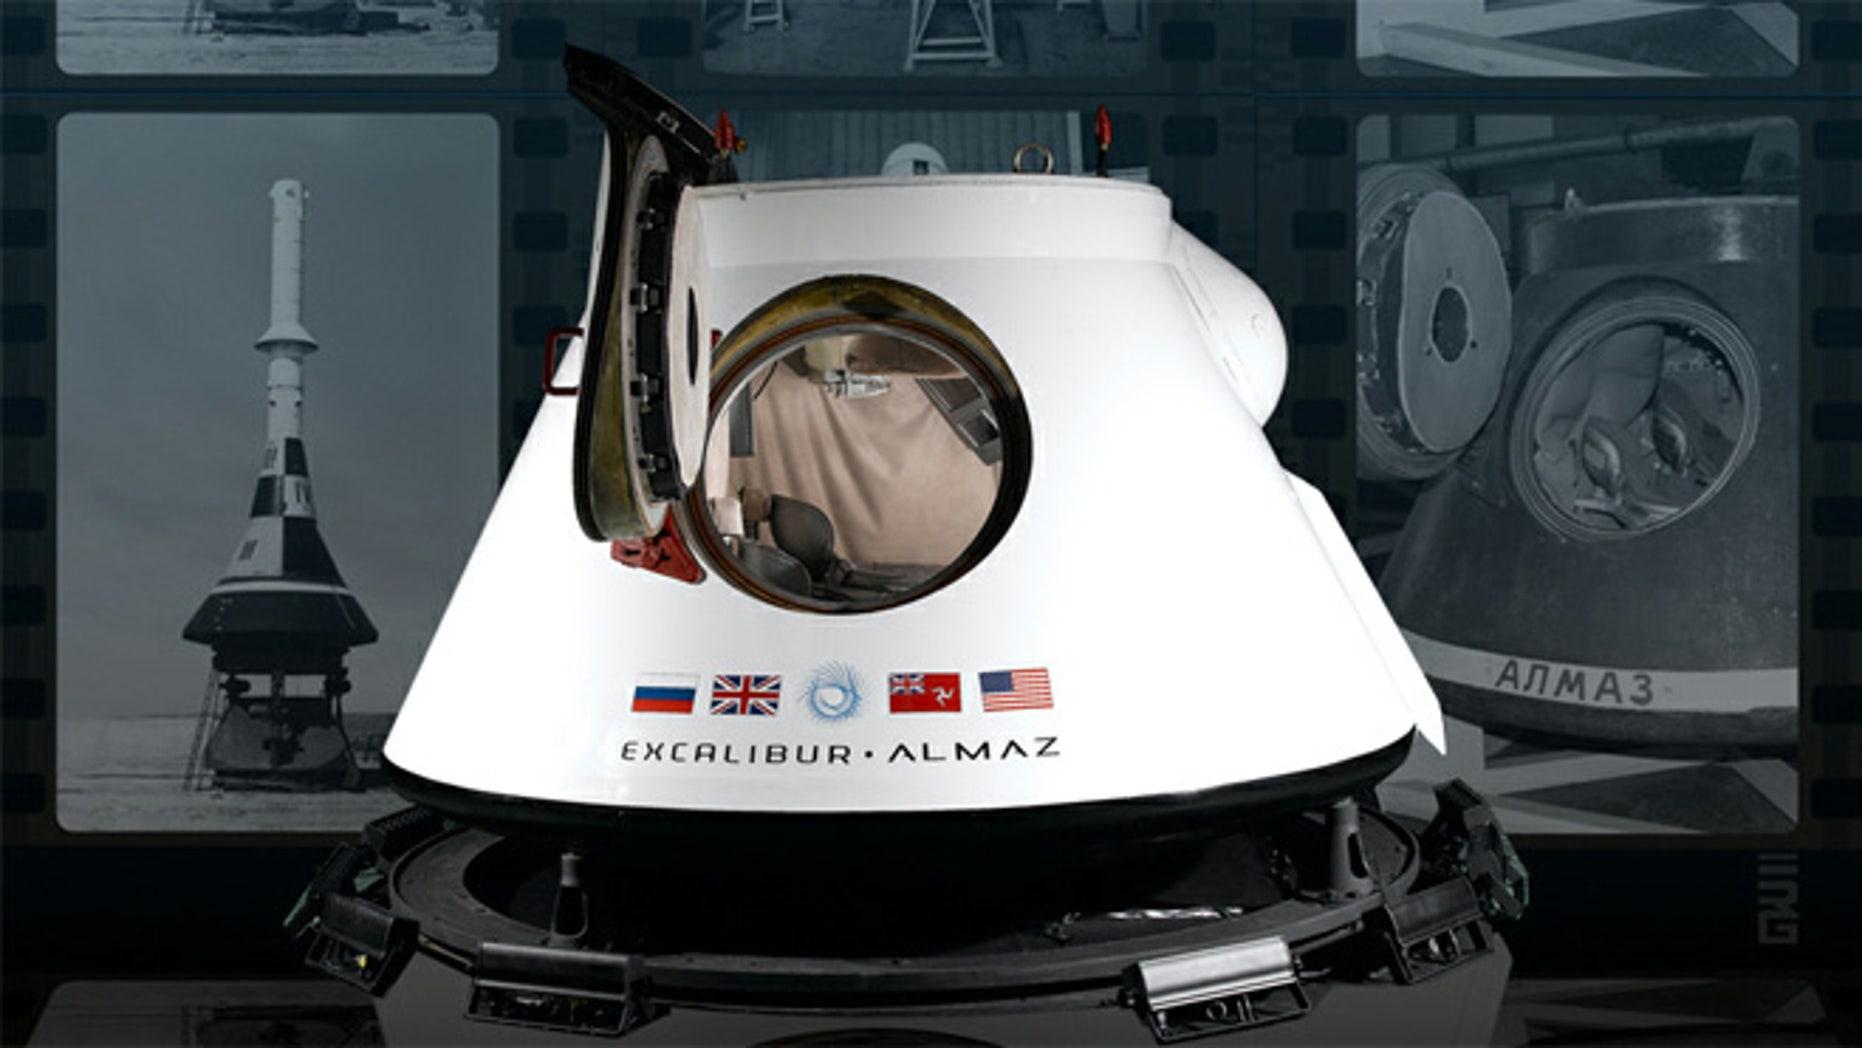 Excalibur Almaz's reusable return vehicle.